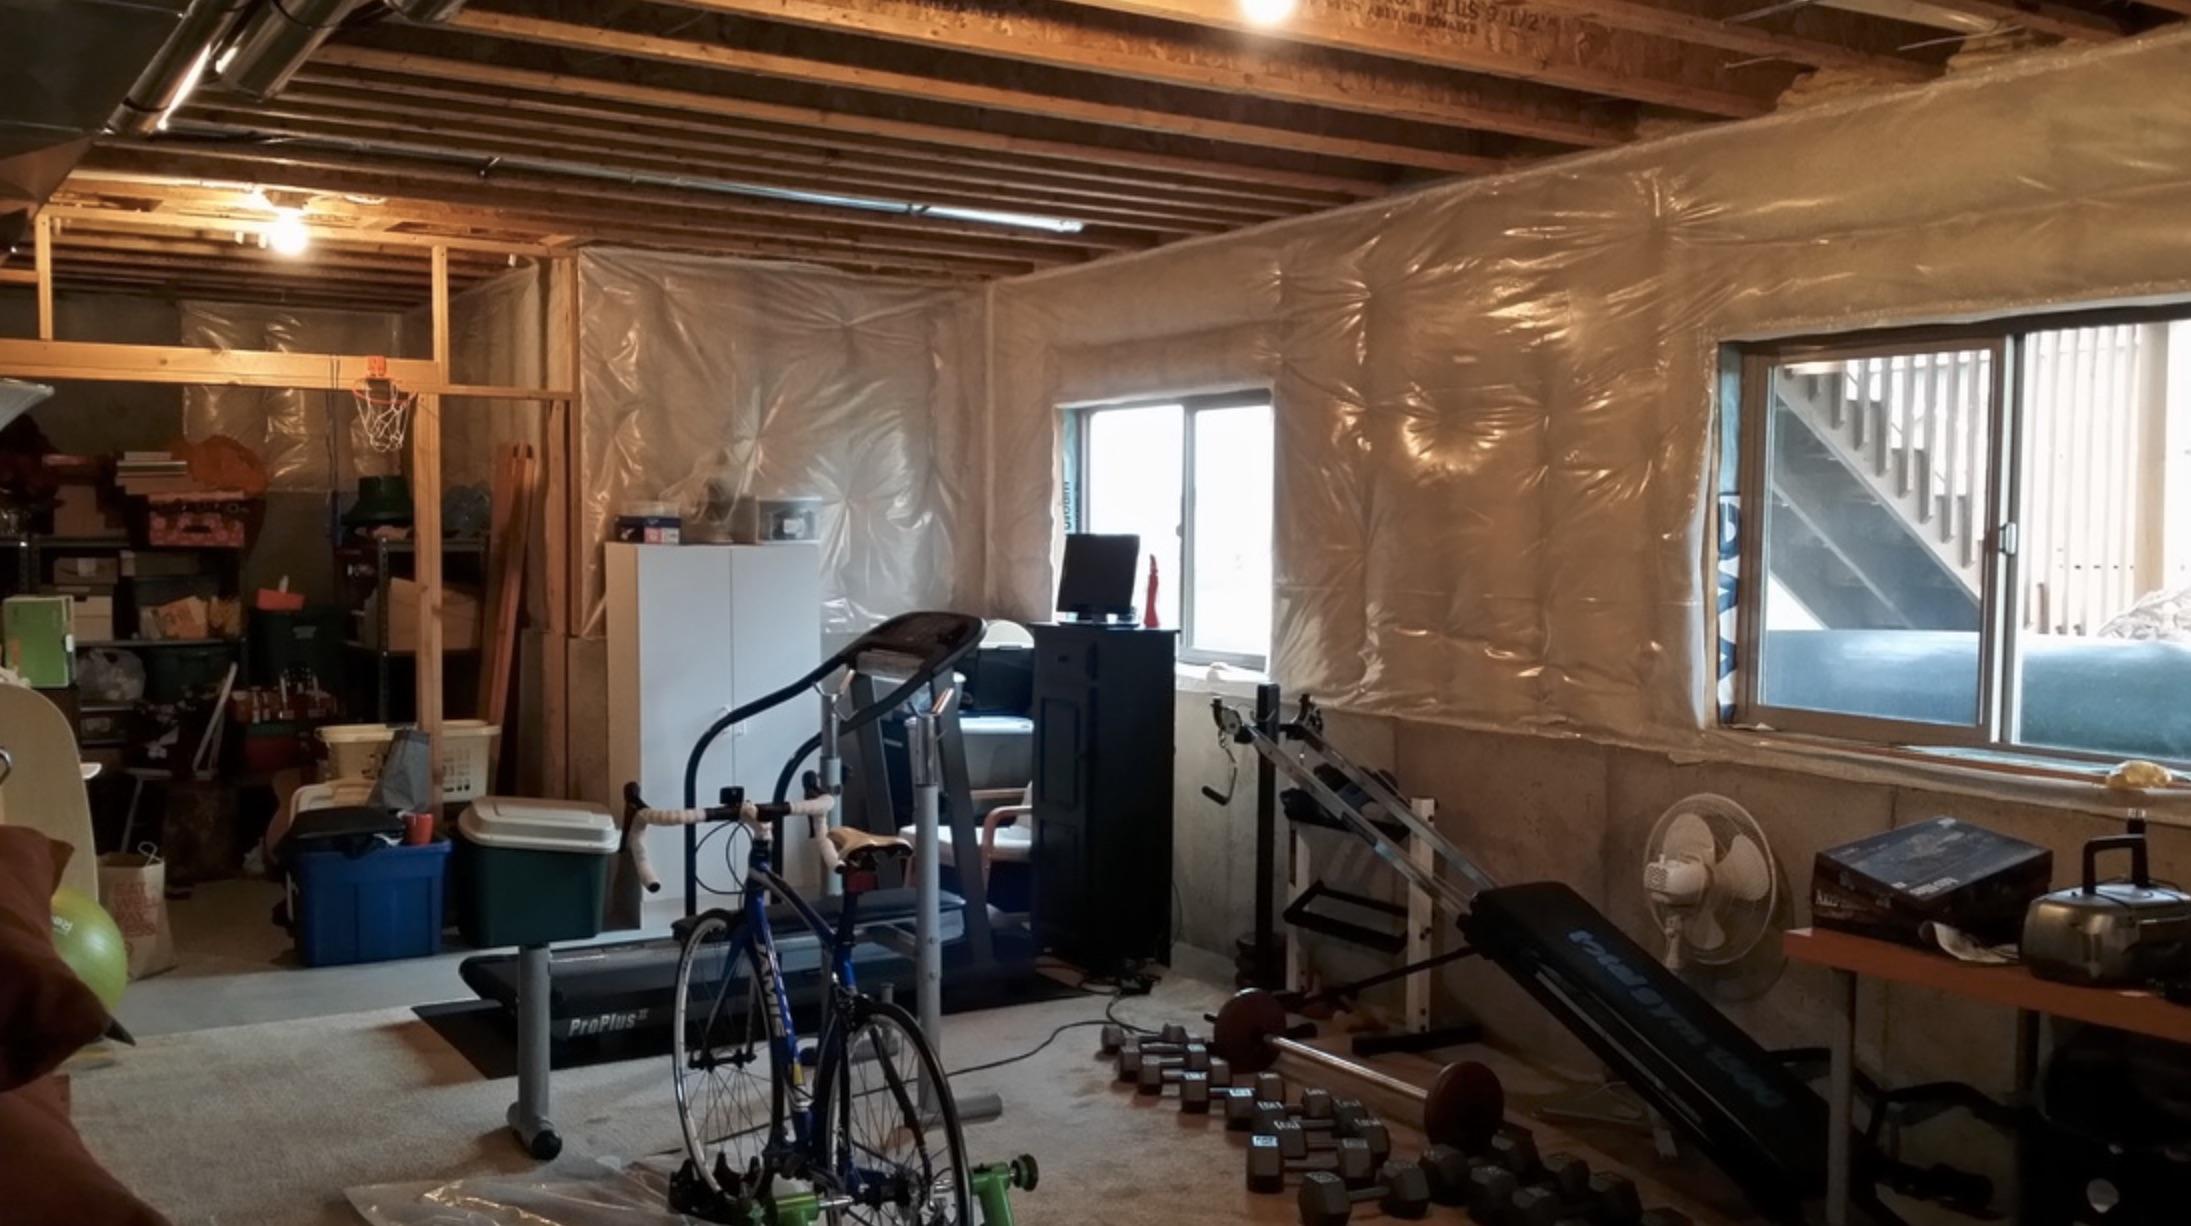 https://www.shccontracting.com/wp-content/uploads/2015/05/basement-before.jpg